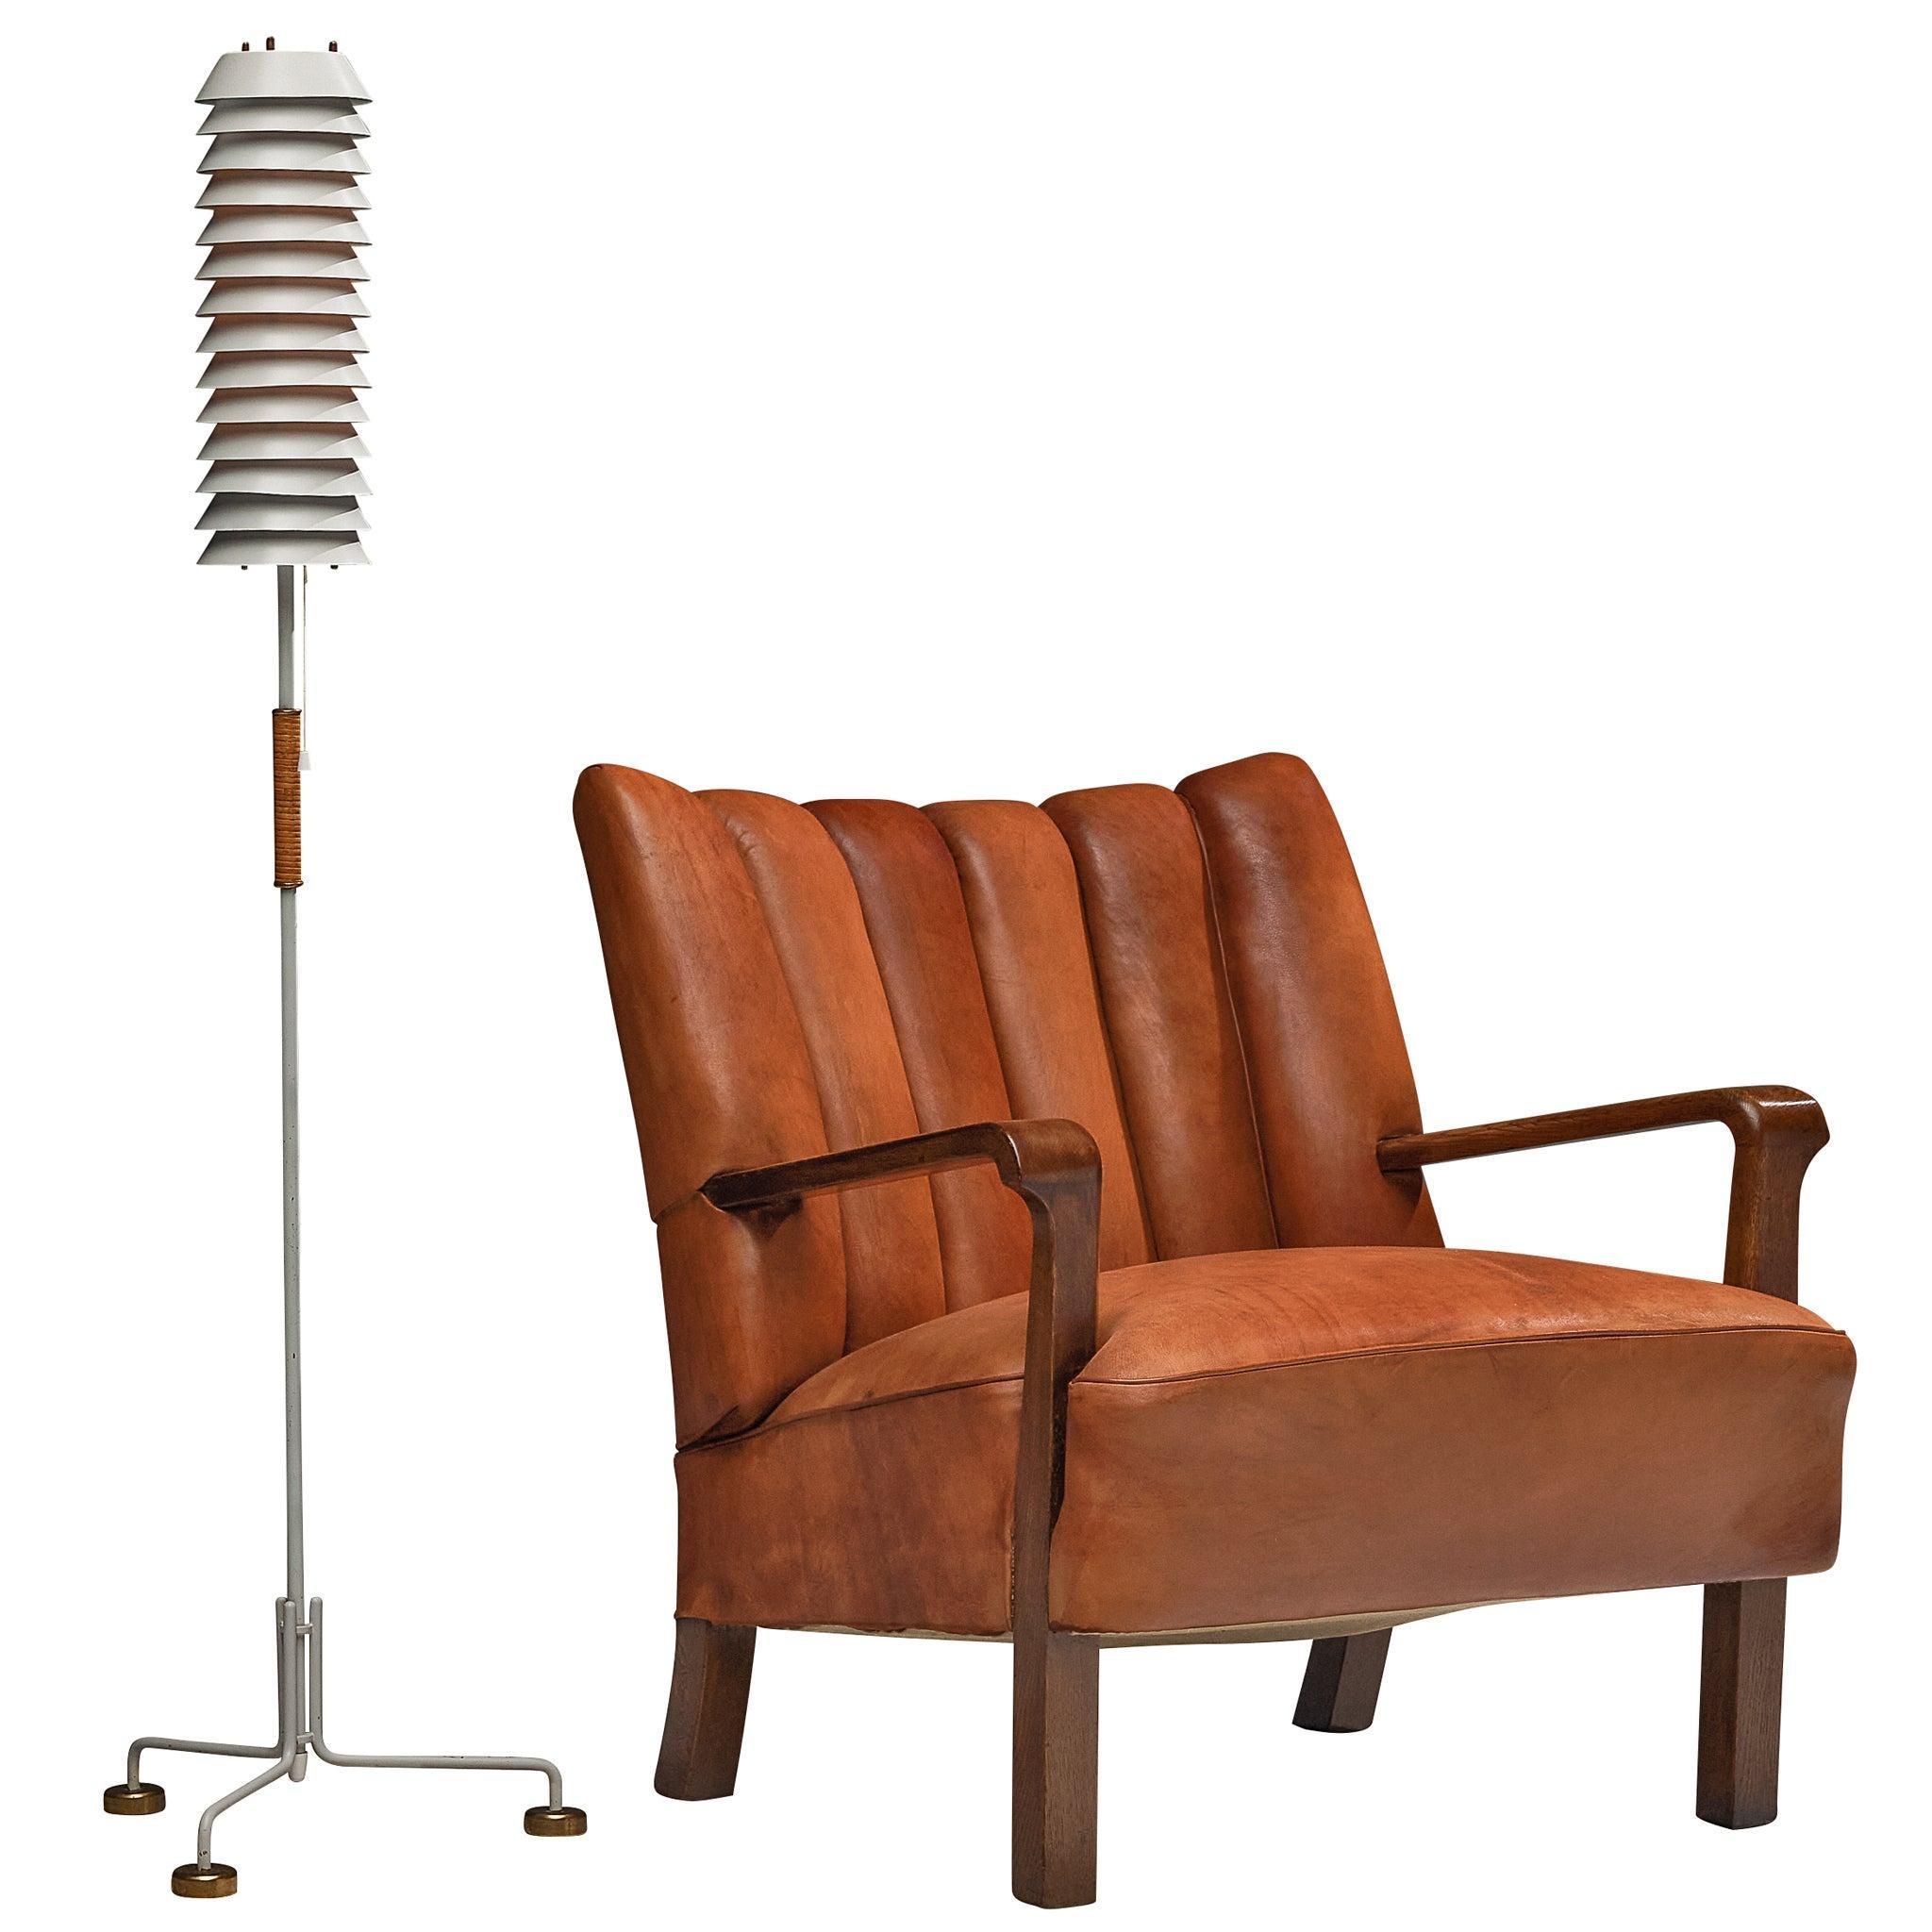 Rare Acton Bjørn Armchair in Original Leather and Tapiovaara 'Maija' Floor Lamp